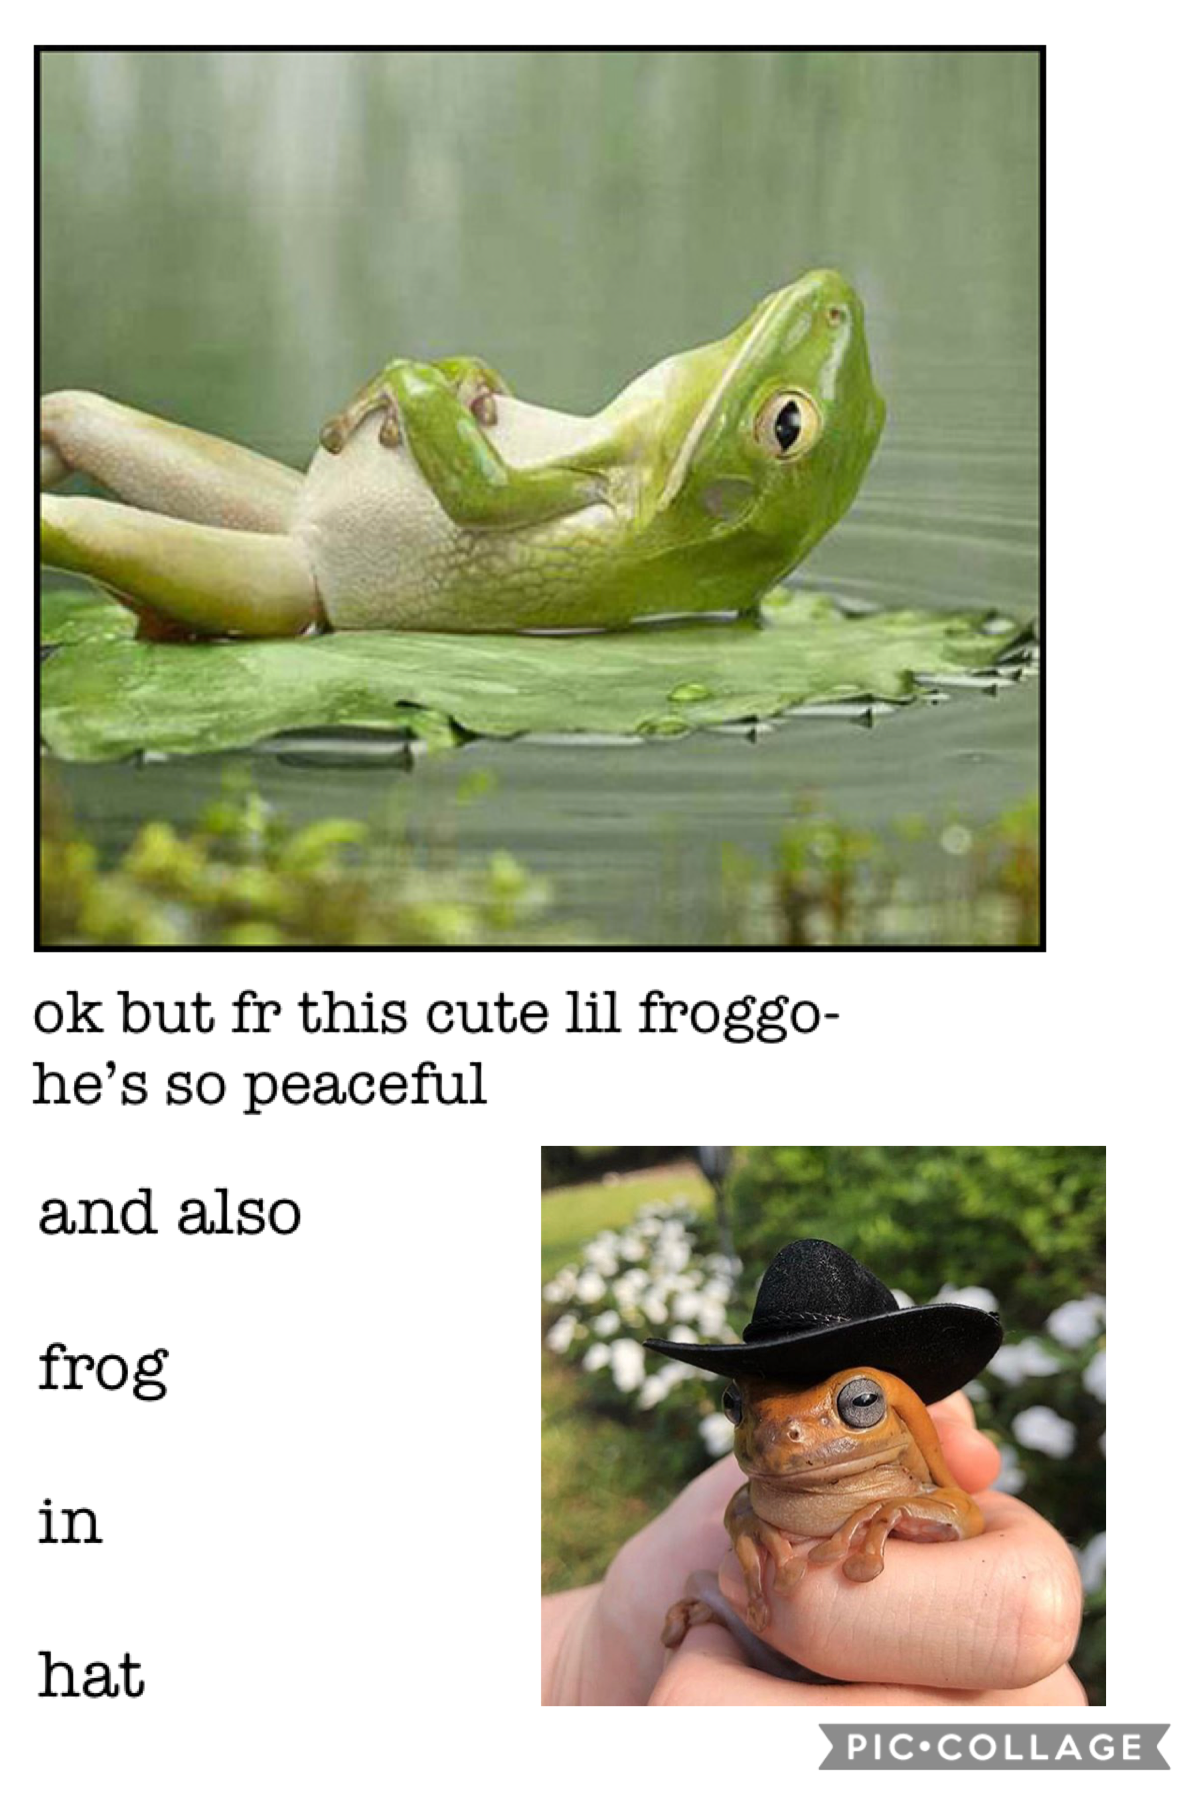 ASHGAHGSHAGSGHAGA I LOVE FROGGOS